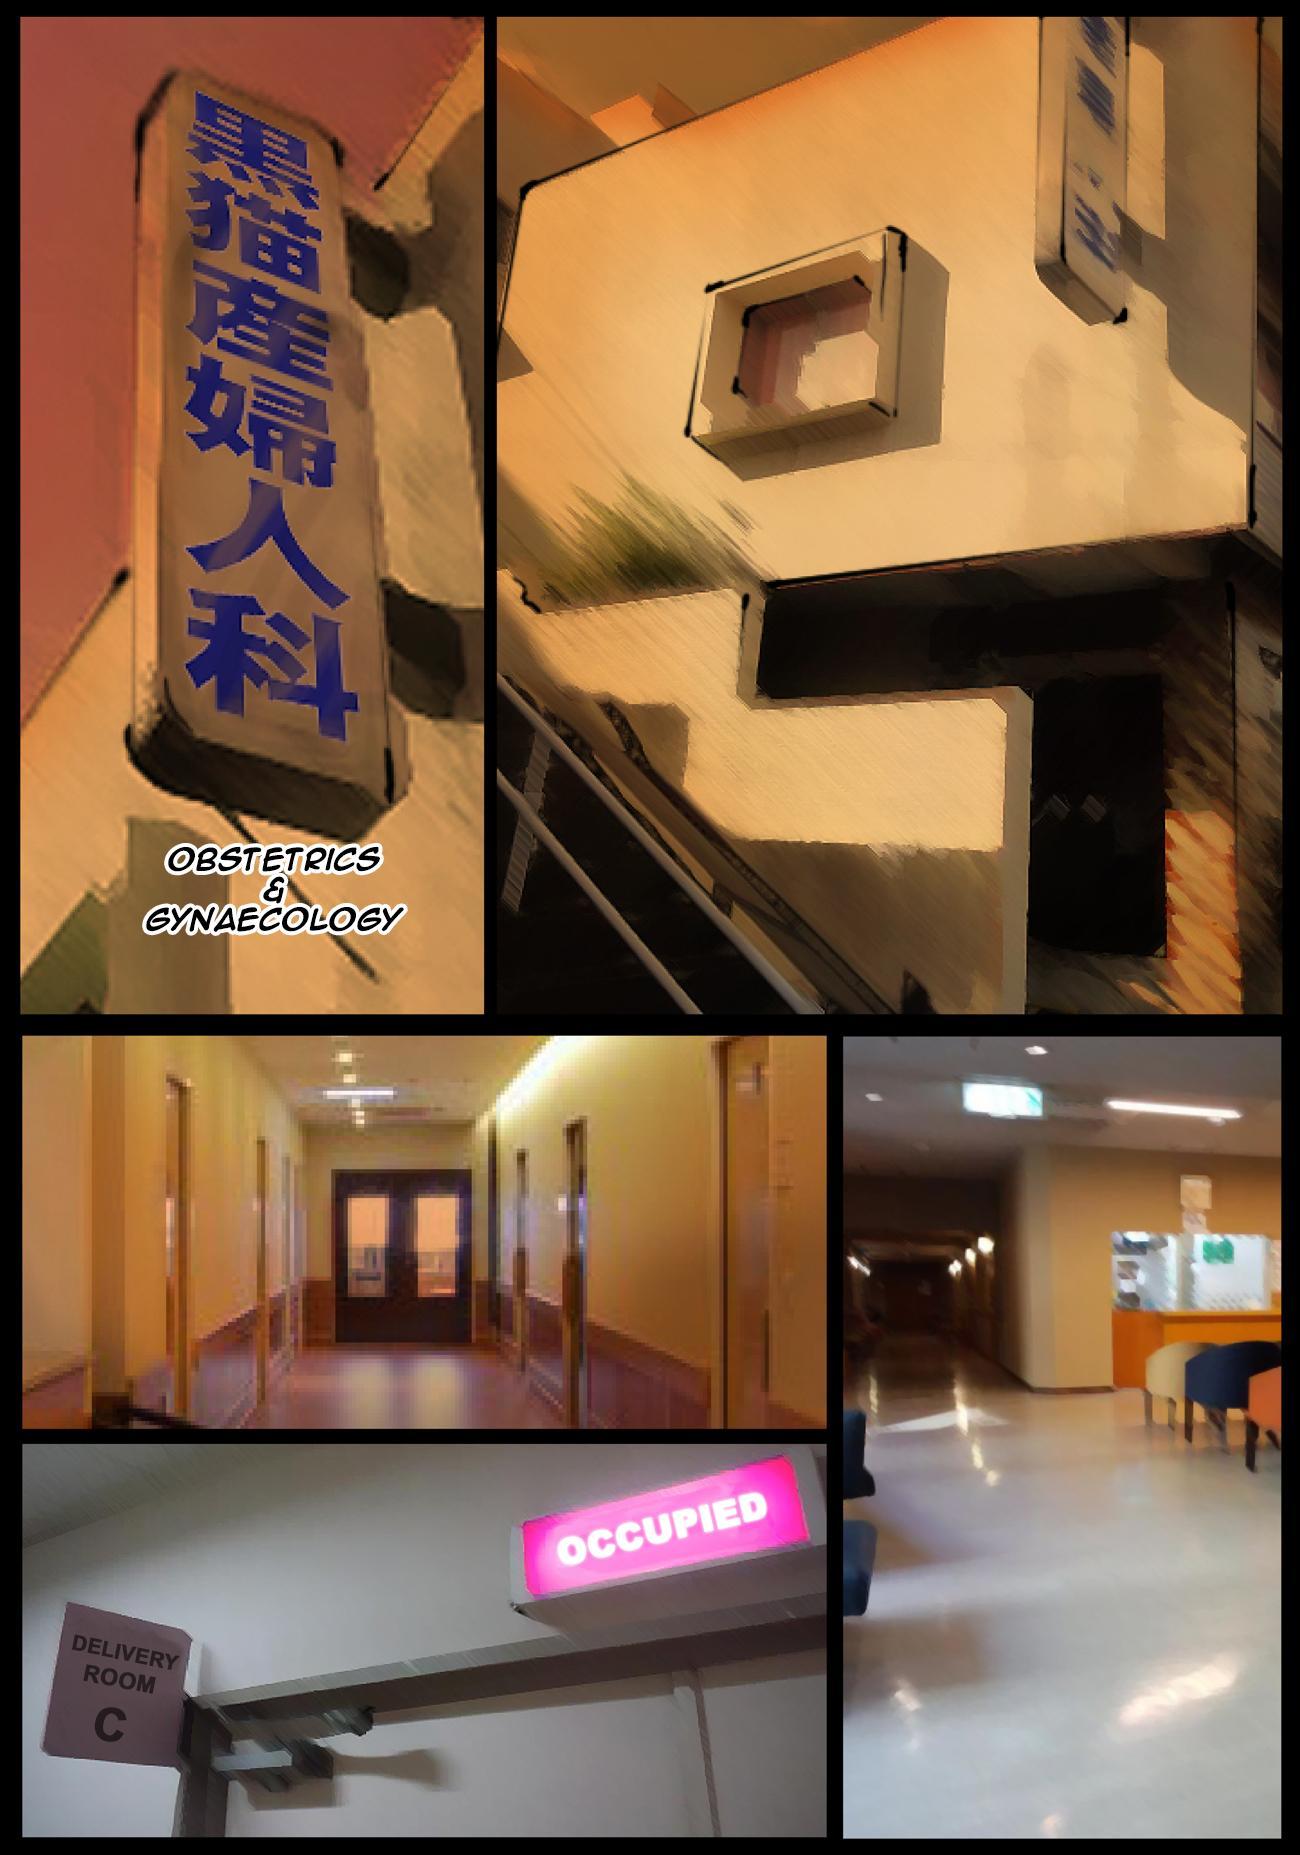 [Kuroneko Smith] Kaa-san no Ana Tsukawasete ~Zenpen~ | Cumming Inside Mommy's Hole 1 [English] [MonaS] [Digital] 1